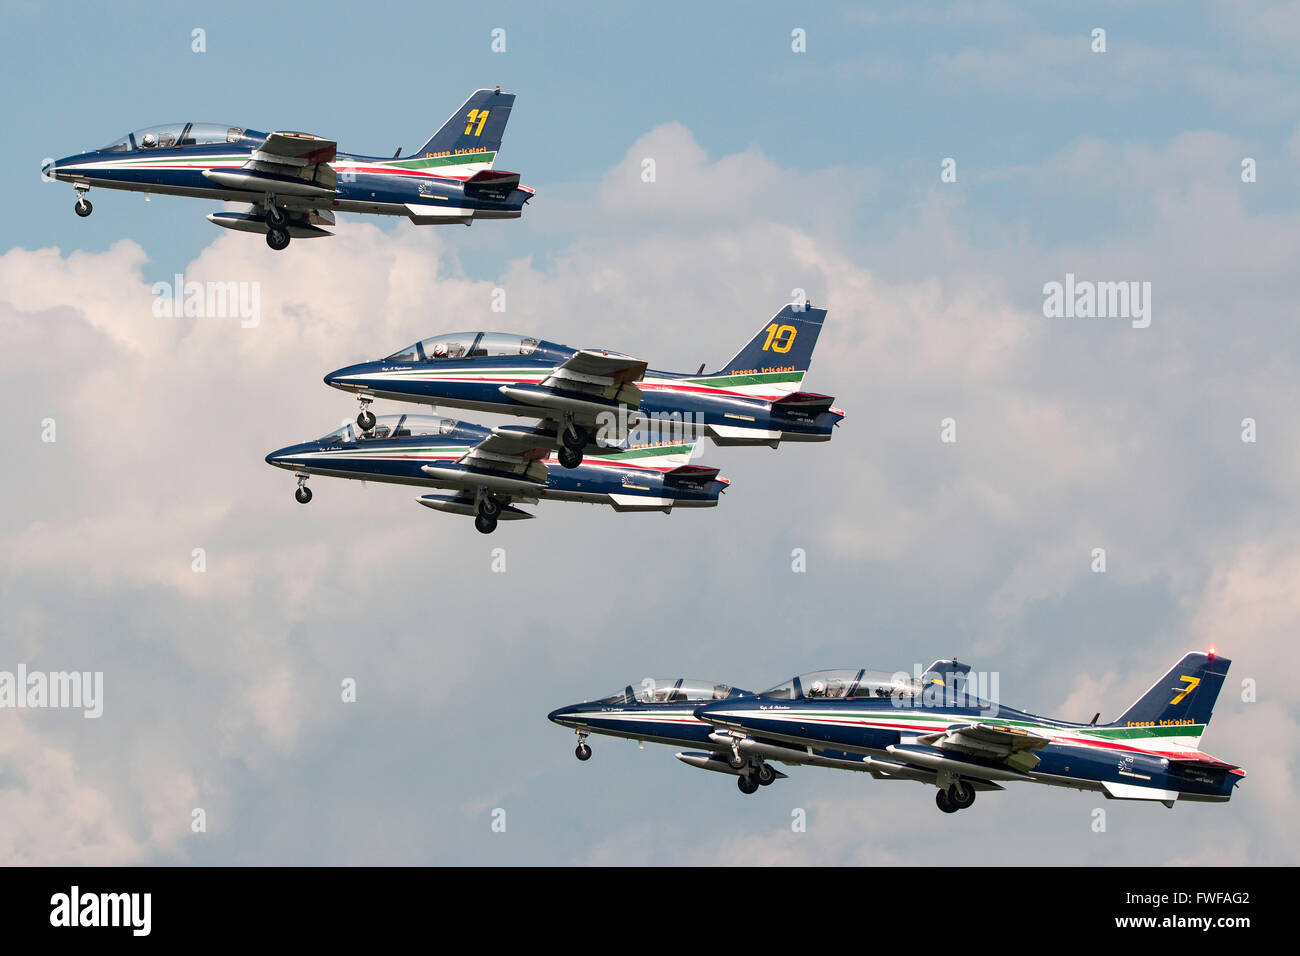 Italian Air Force (Aeronautica Militare Italiana) Aermacchi MB-339 aircraft of the Frecce Tricolori formation display Stock Photo